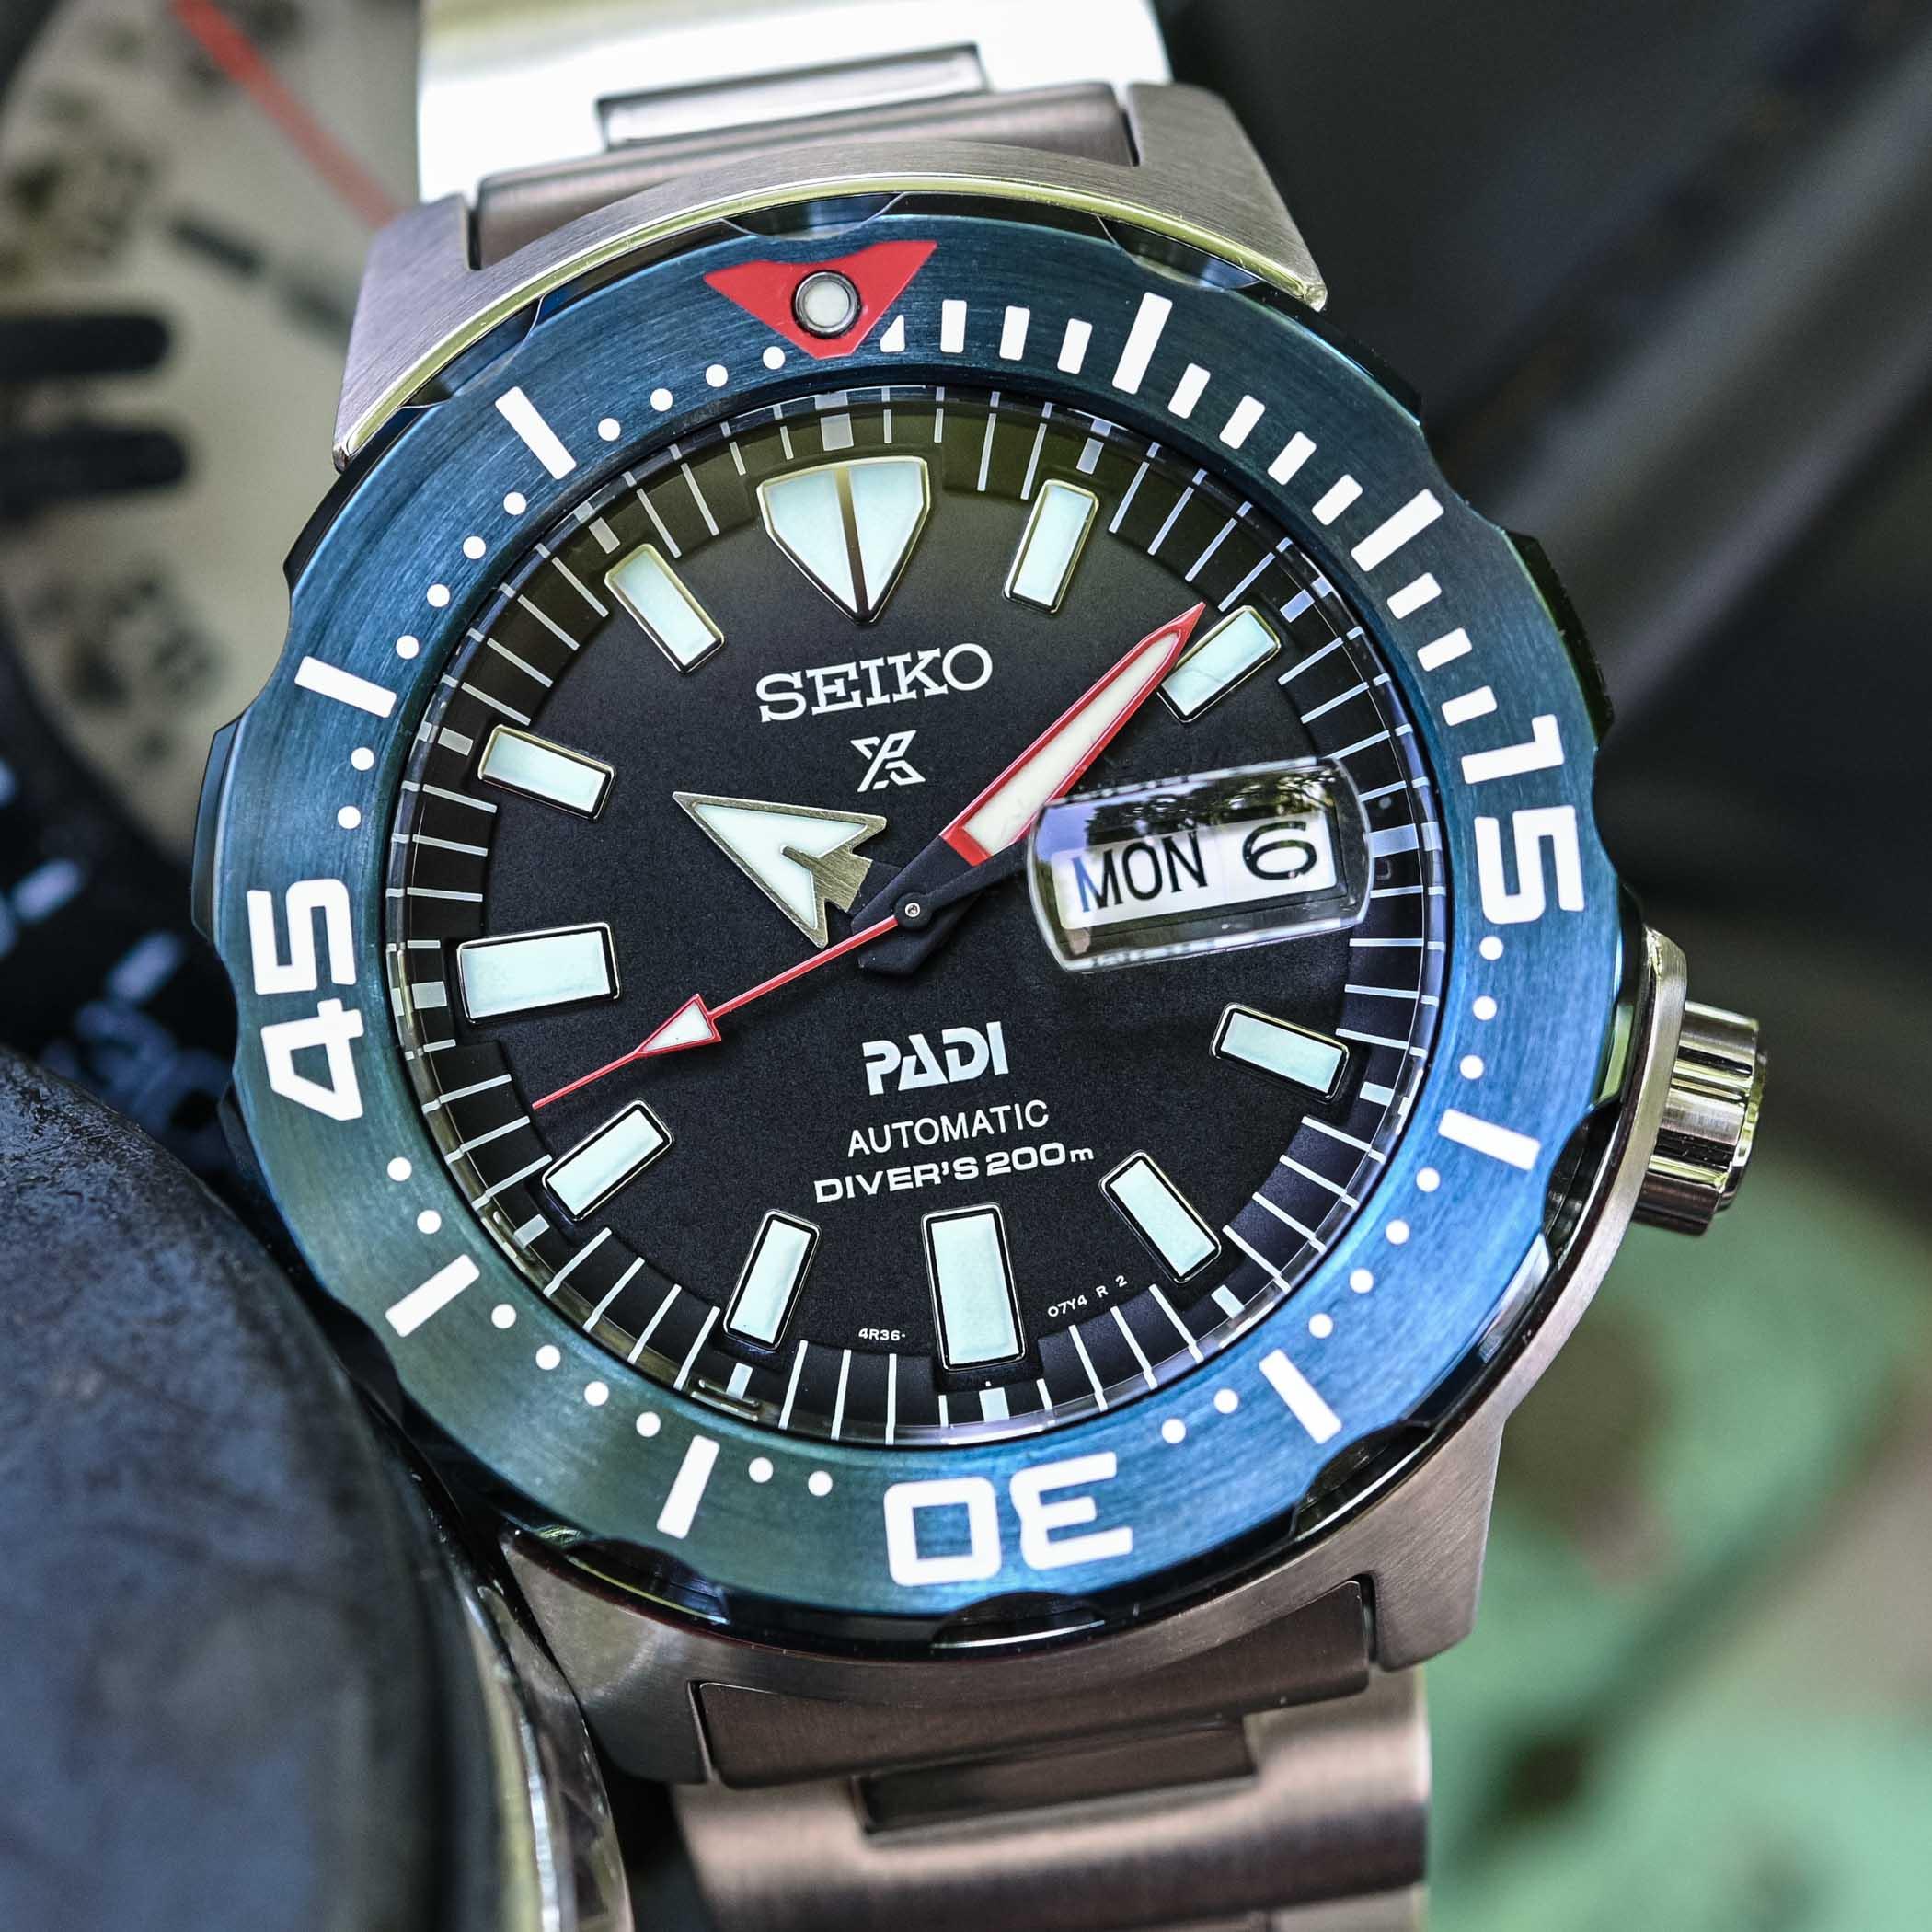 Seiko Prospex Diver Monster PADI Edition - SRPE27K1